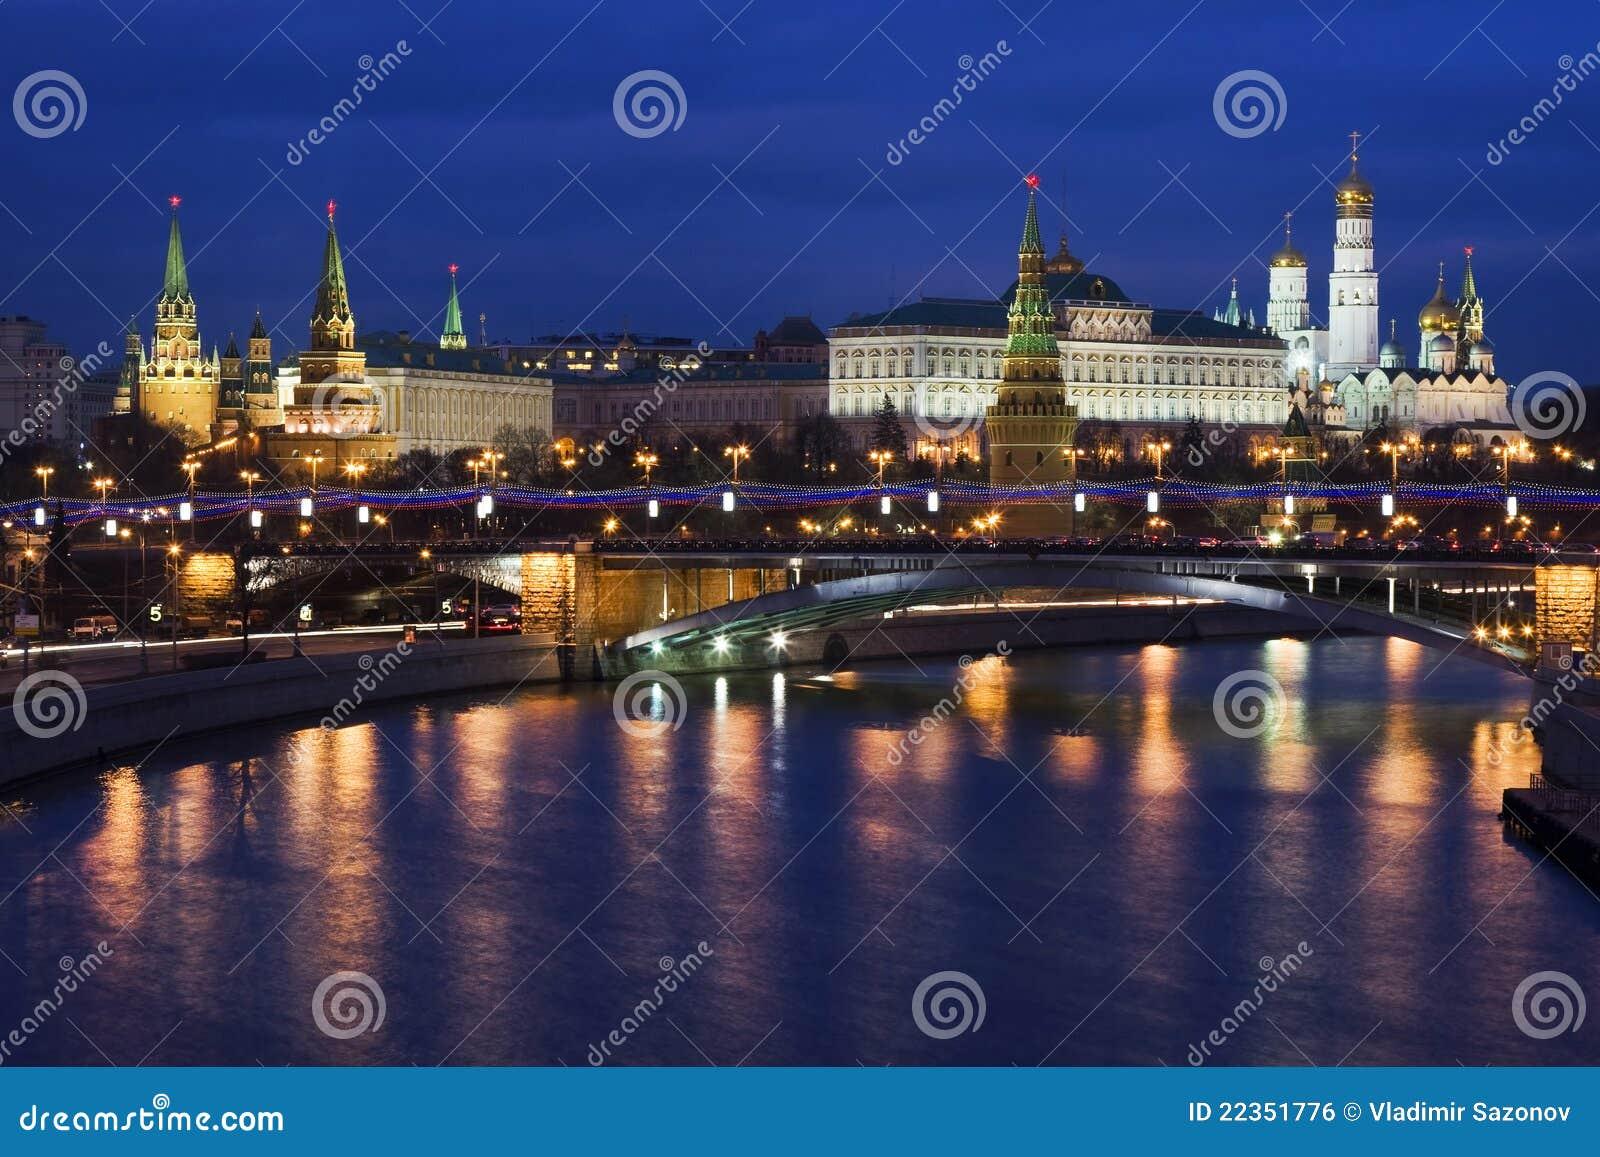 Night Kremlin, Moscow, Russia